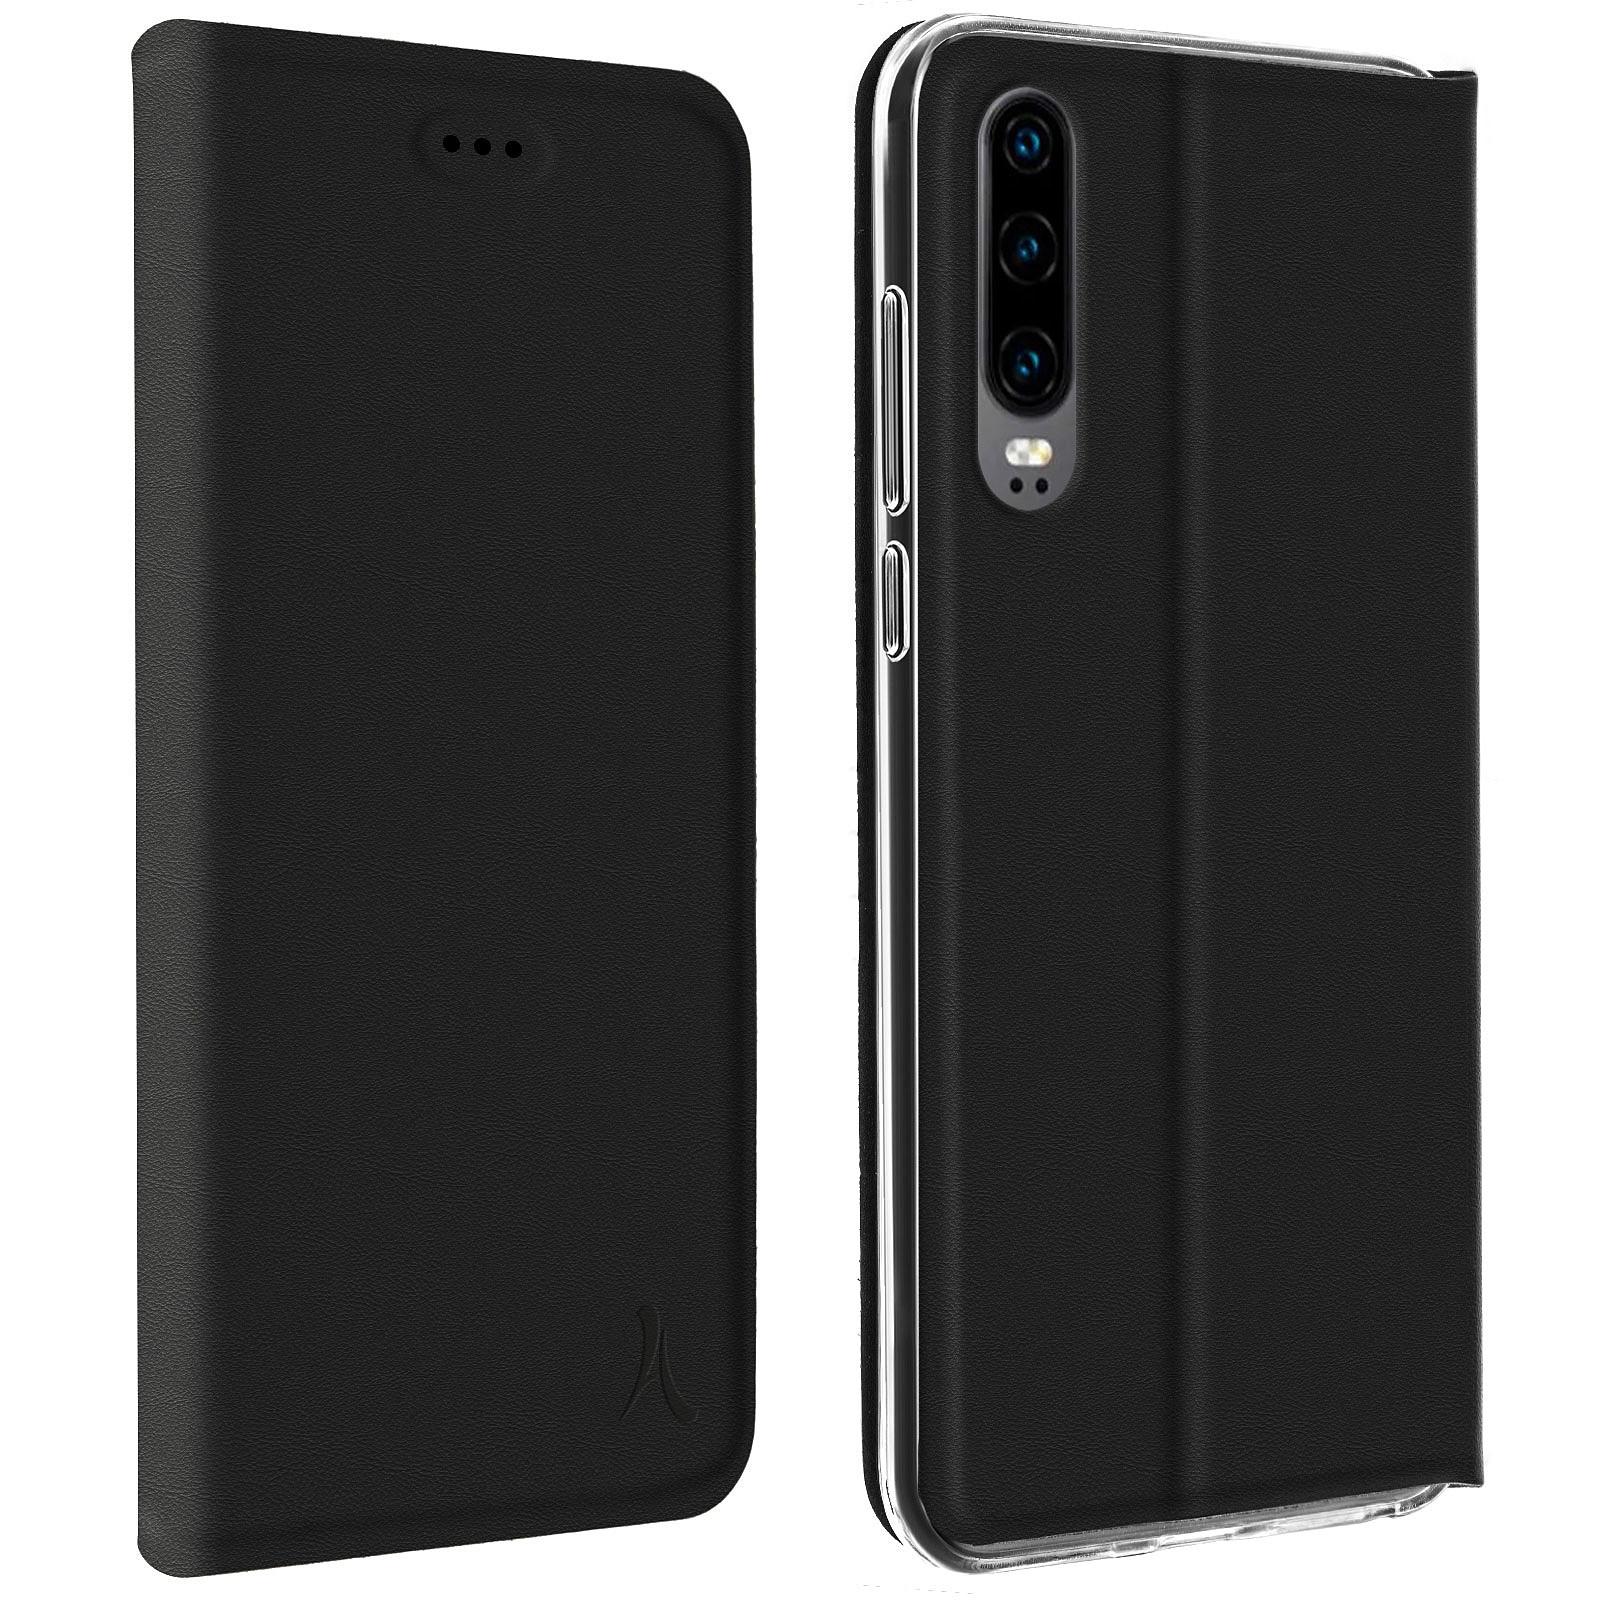 Akashi Etui Folio Porte Carte Noir Huawei P30